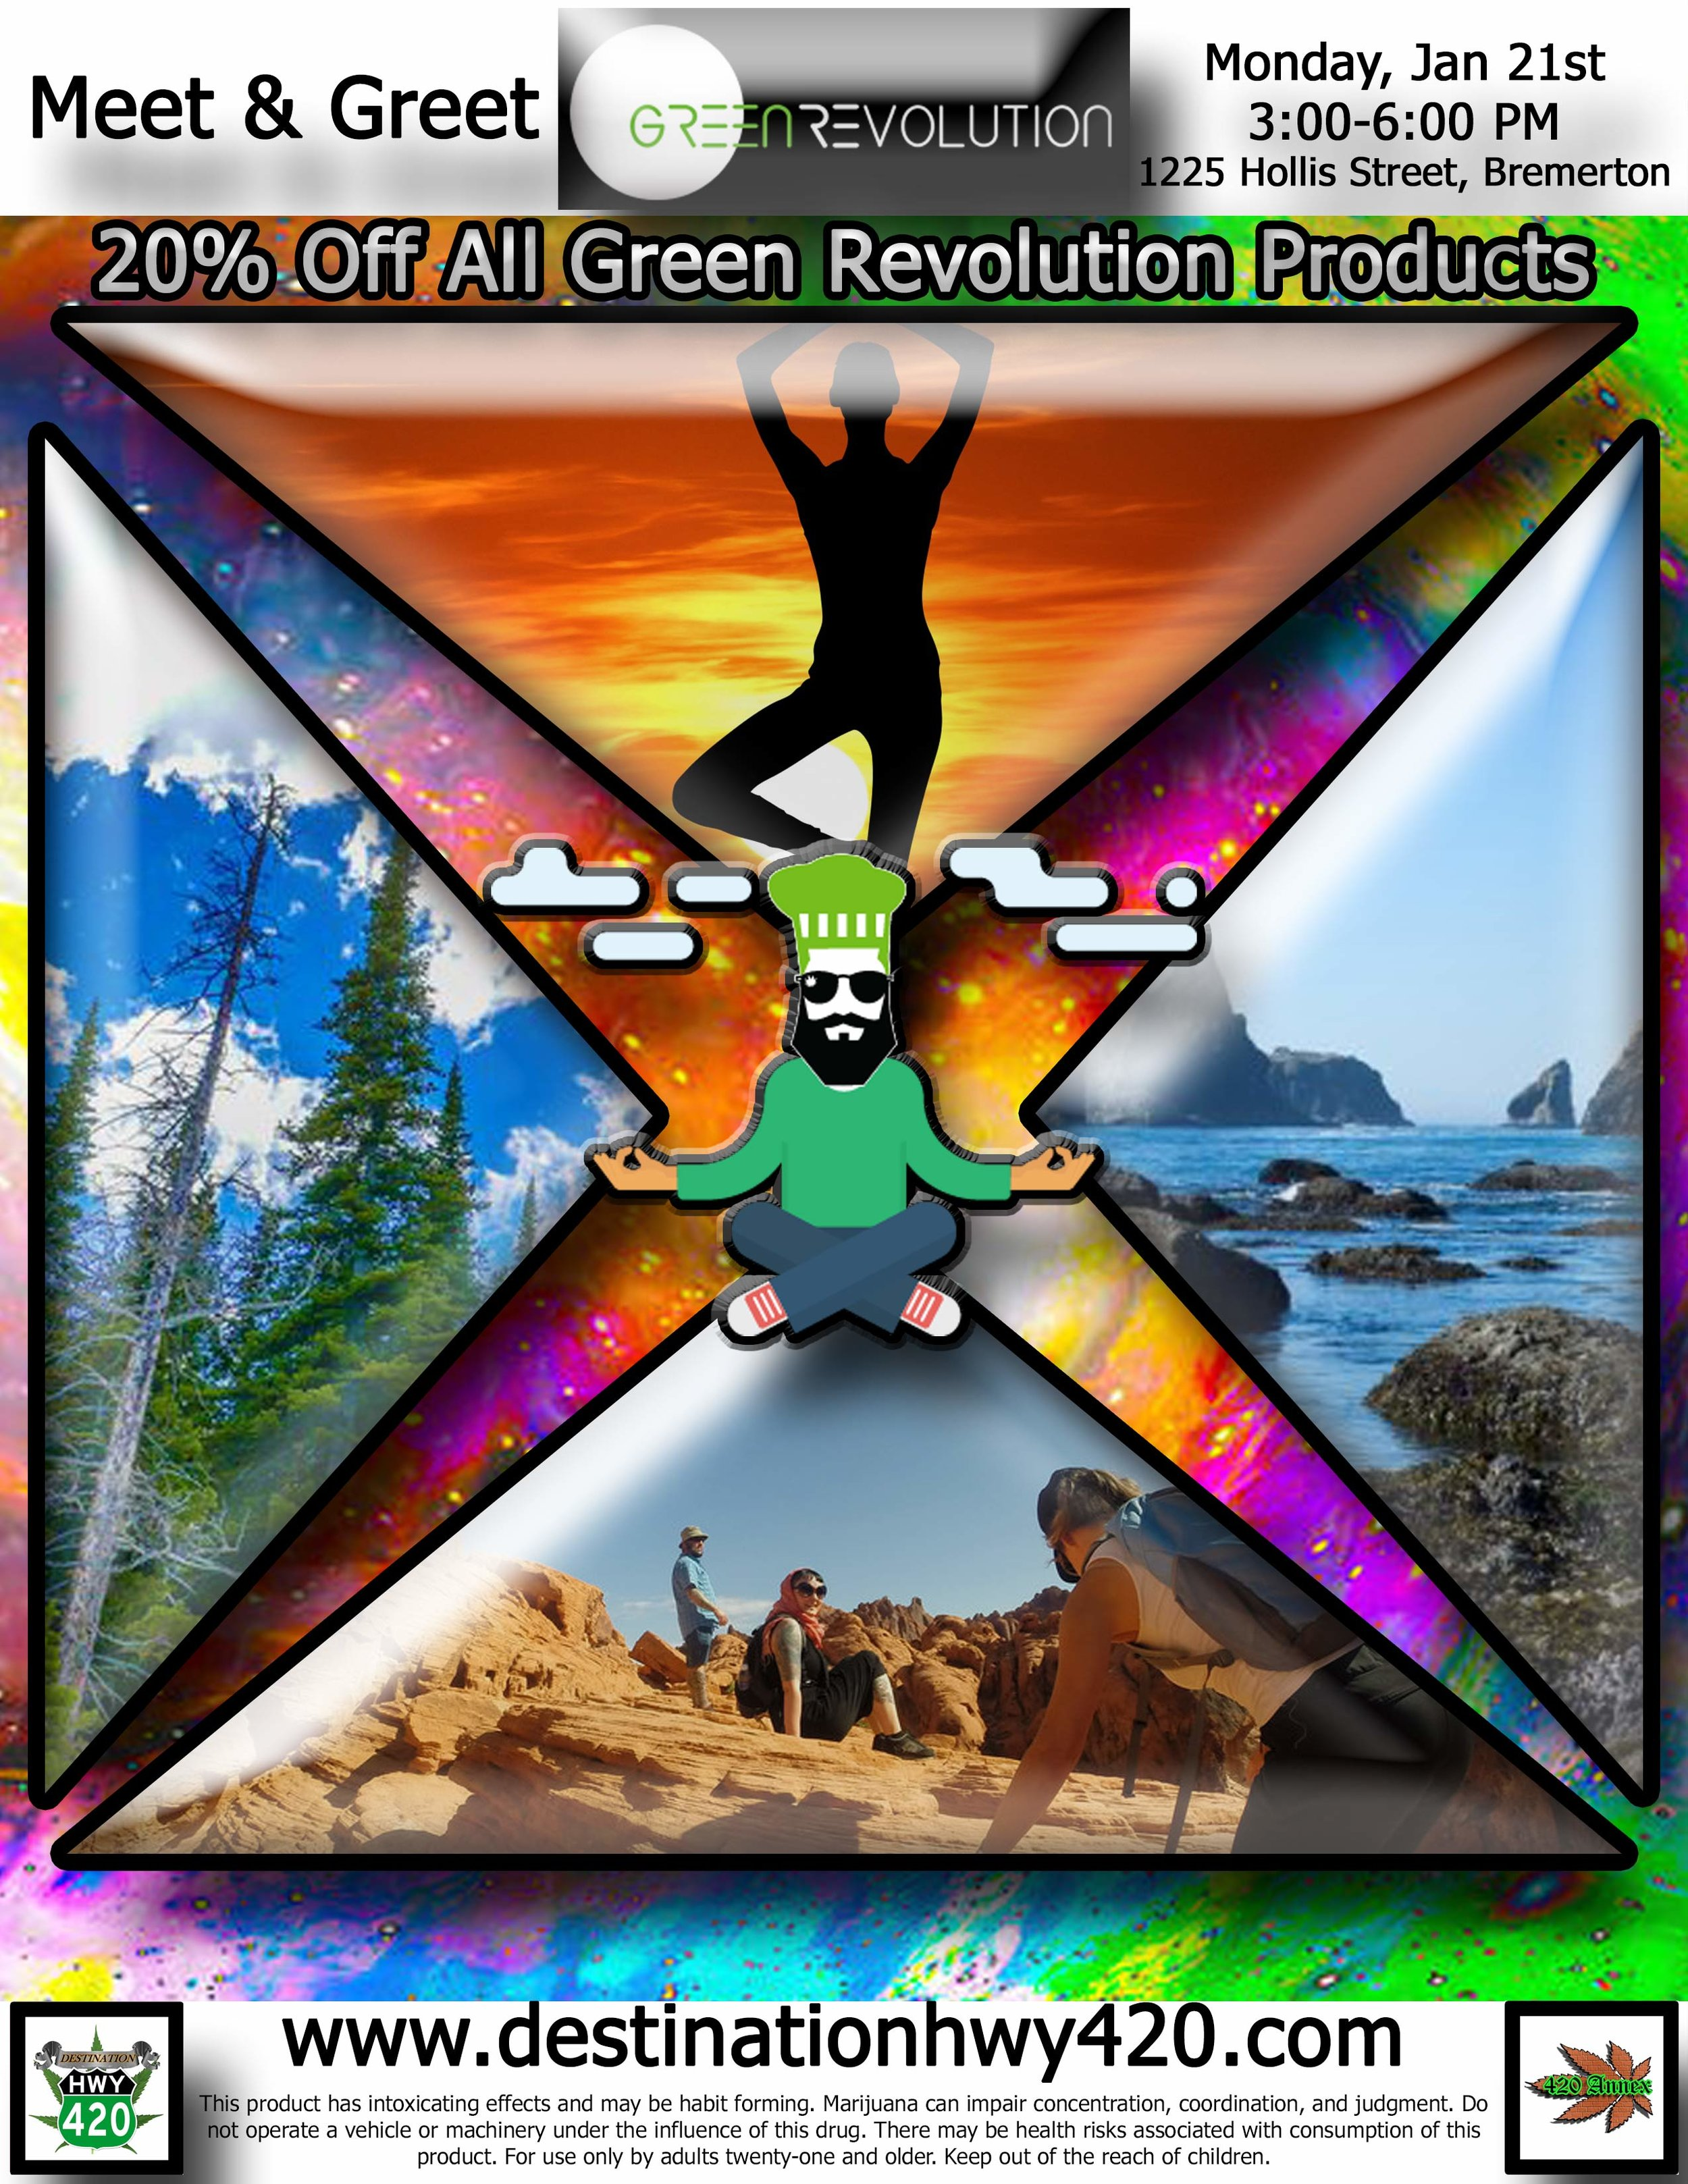 Green-Revolution-Vendor-Day-Flyer3.jpg